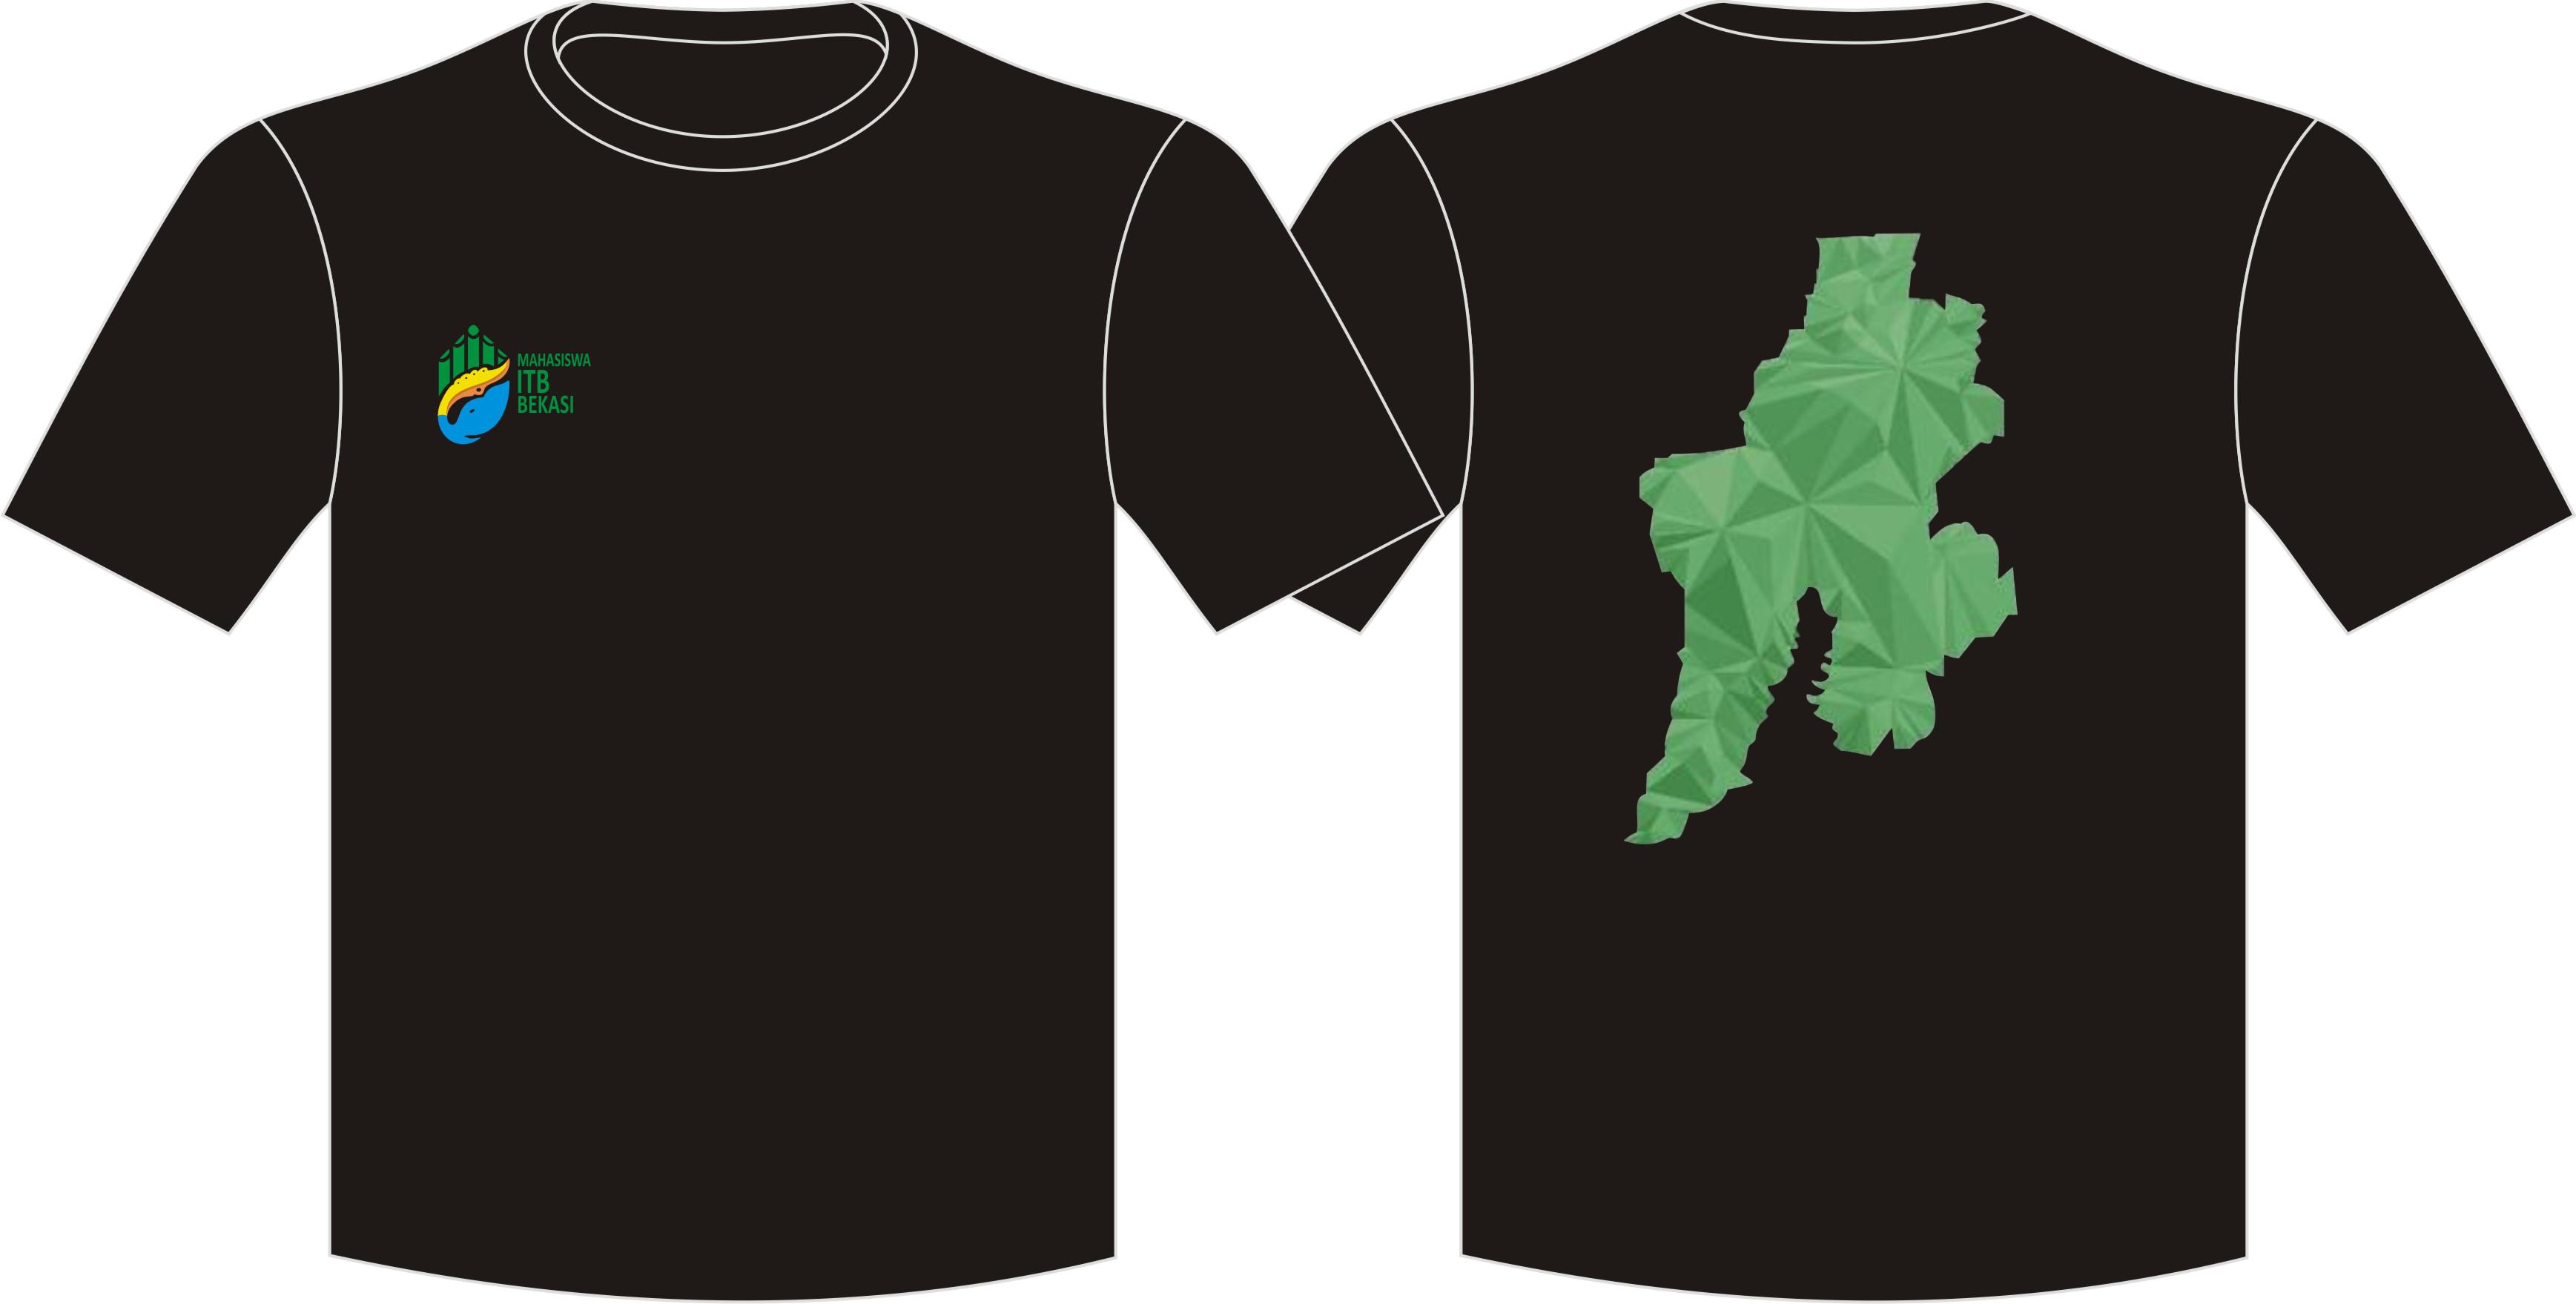 Seragam Kaos MIB, T-Shirt O-Neck ITB